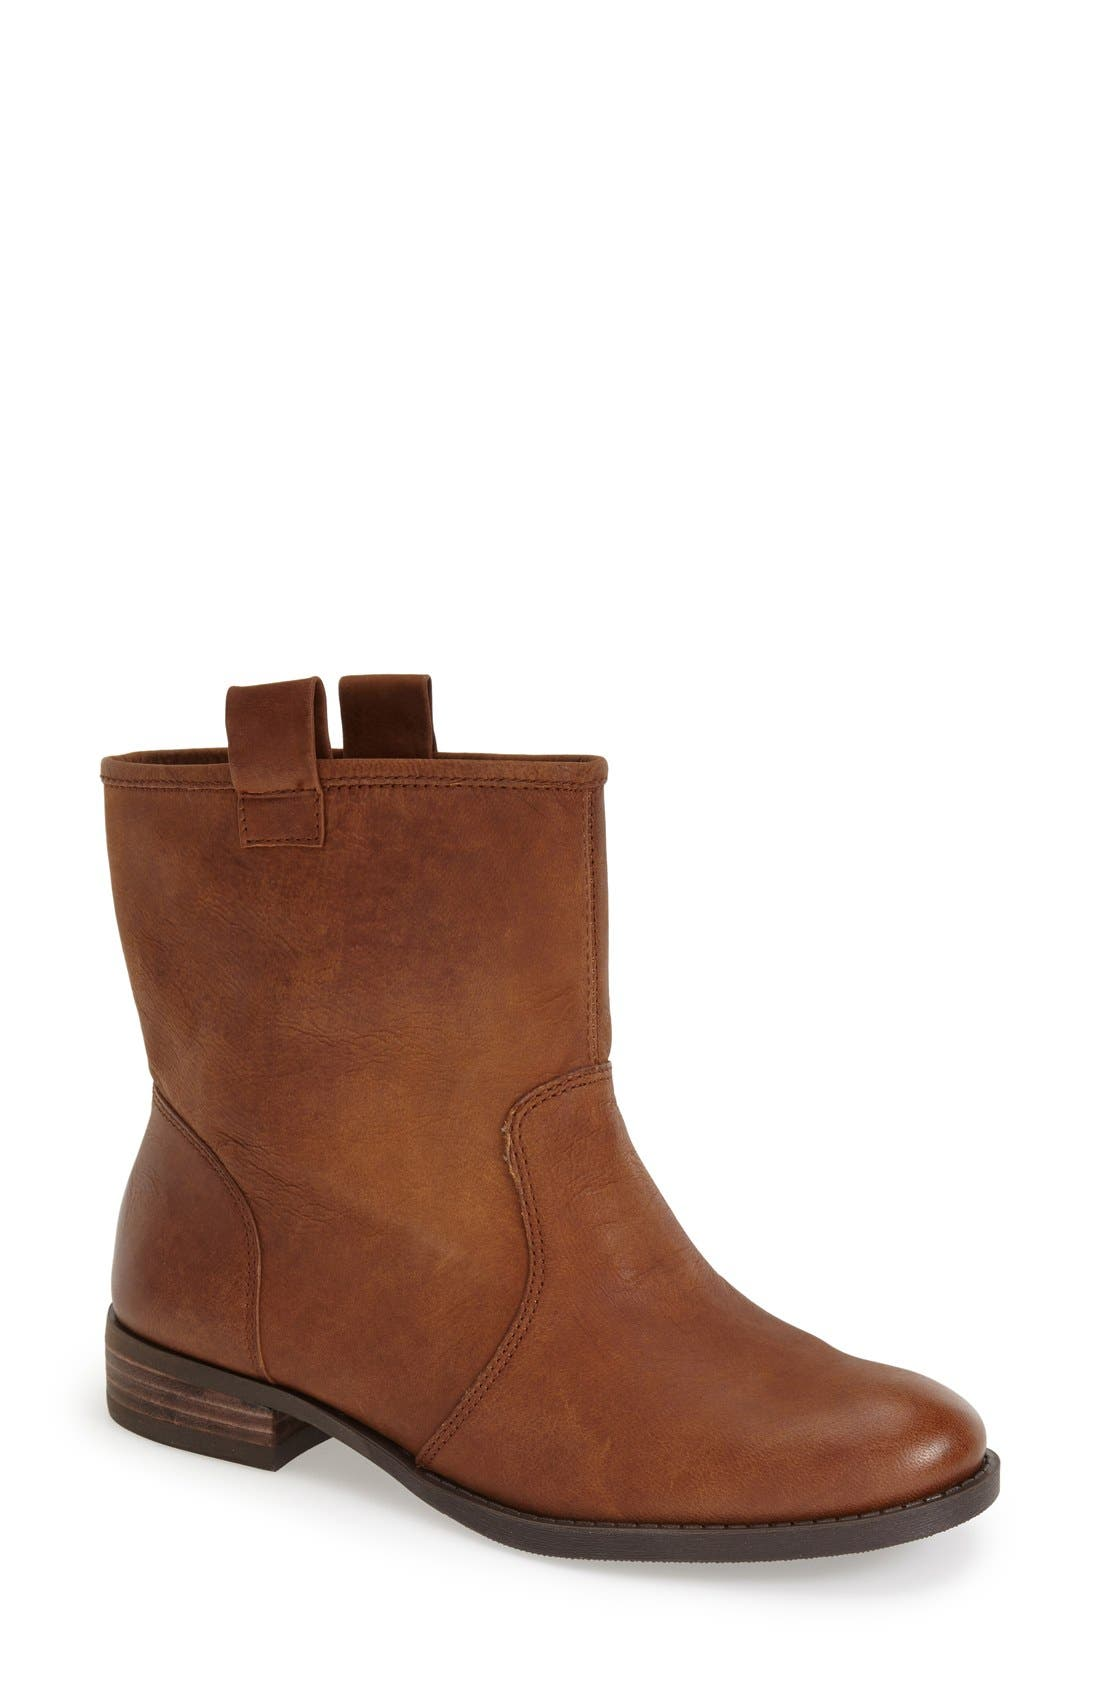 'Natasha' Boot,                             Main thumbnail 1, color,                             Vintage Cognac Leather